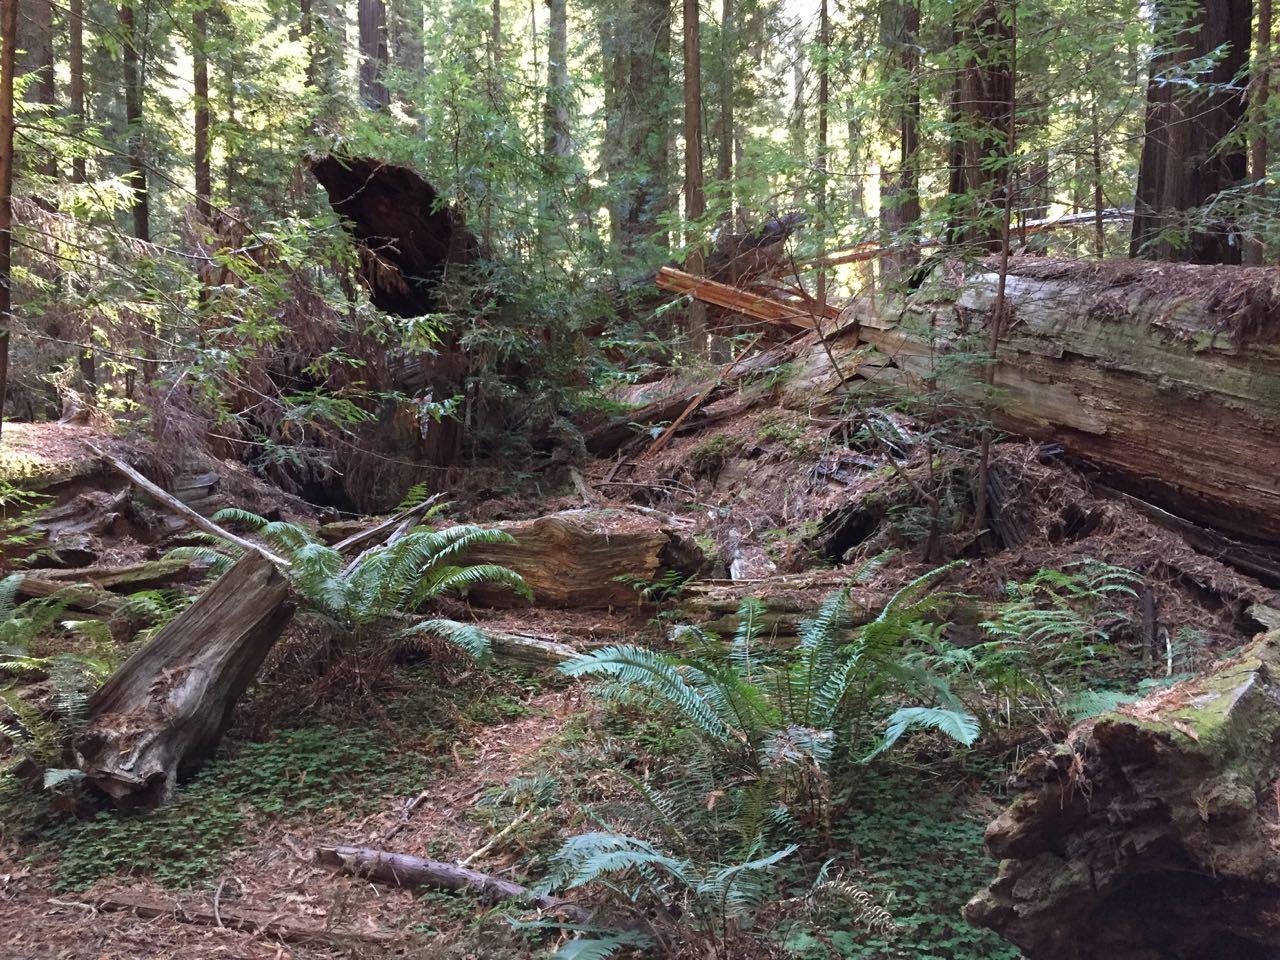 Redwoods 2017 10 01 19 Of 244